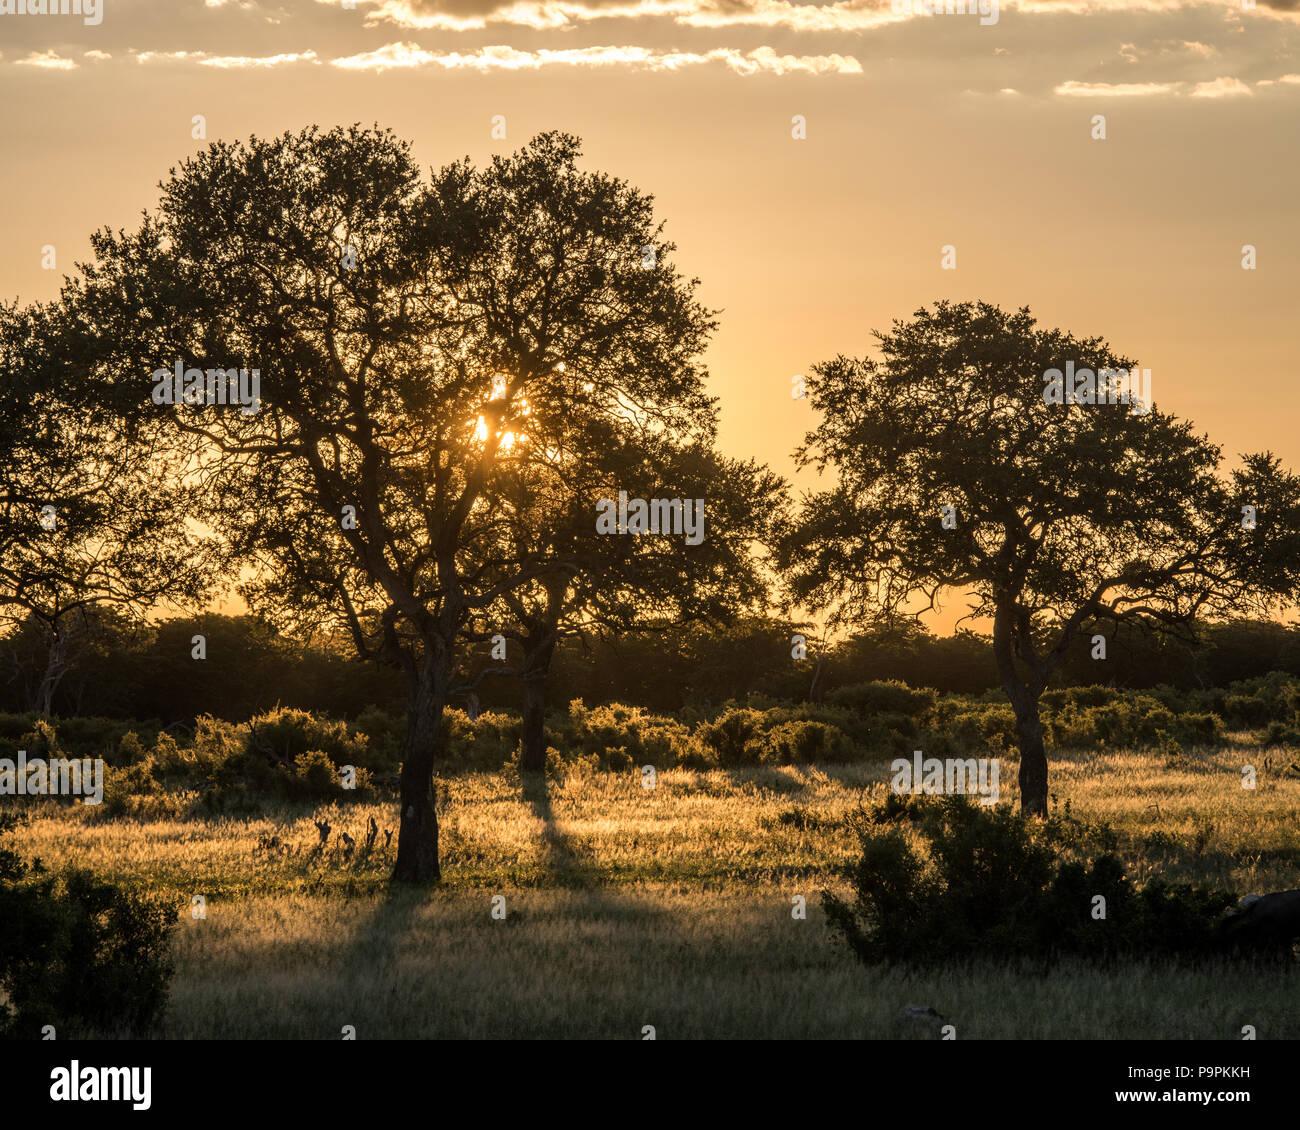 The sun sets over the grasslands in the Hwange National Park, Hwange, Zimbabwe Stock Photo